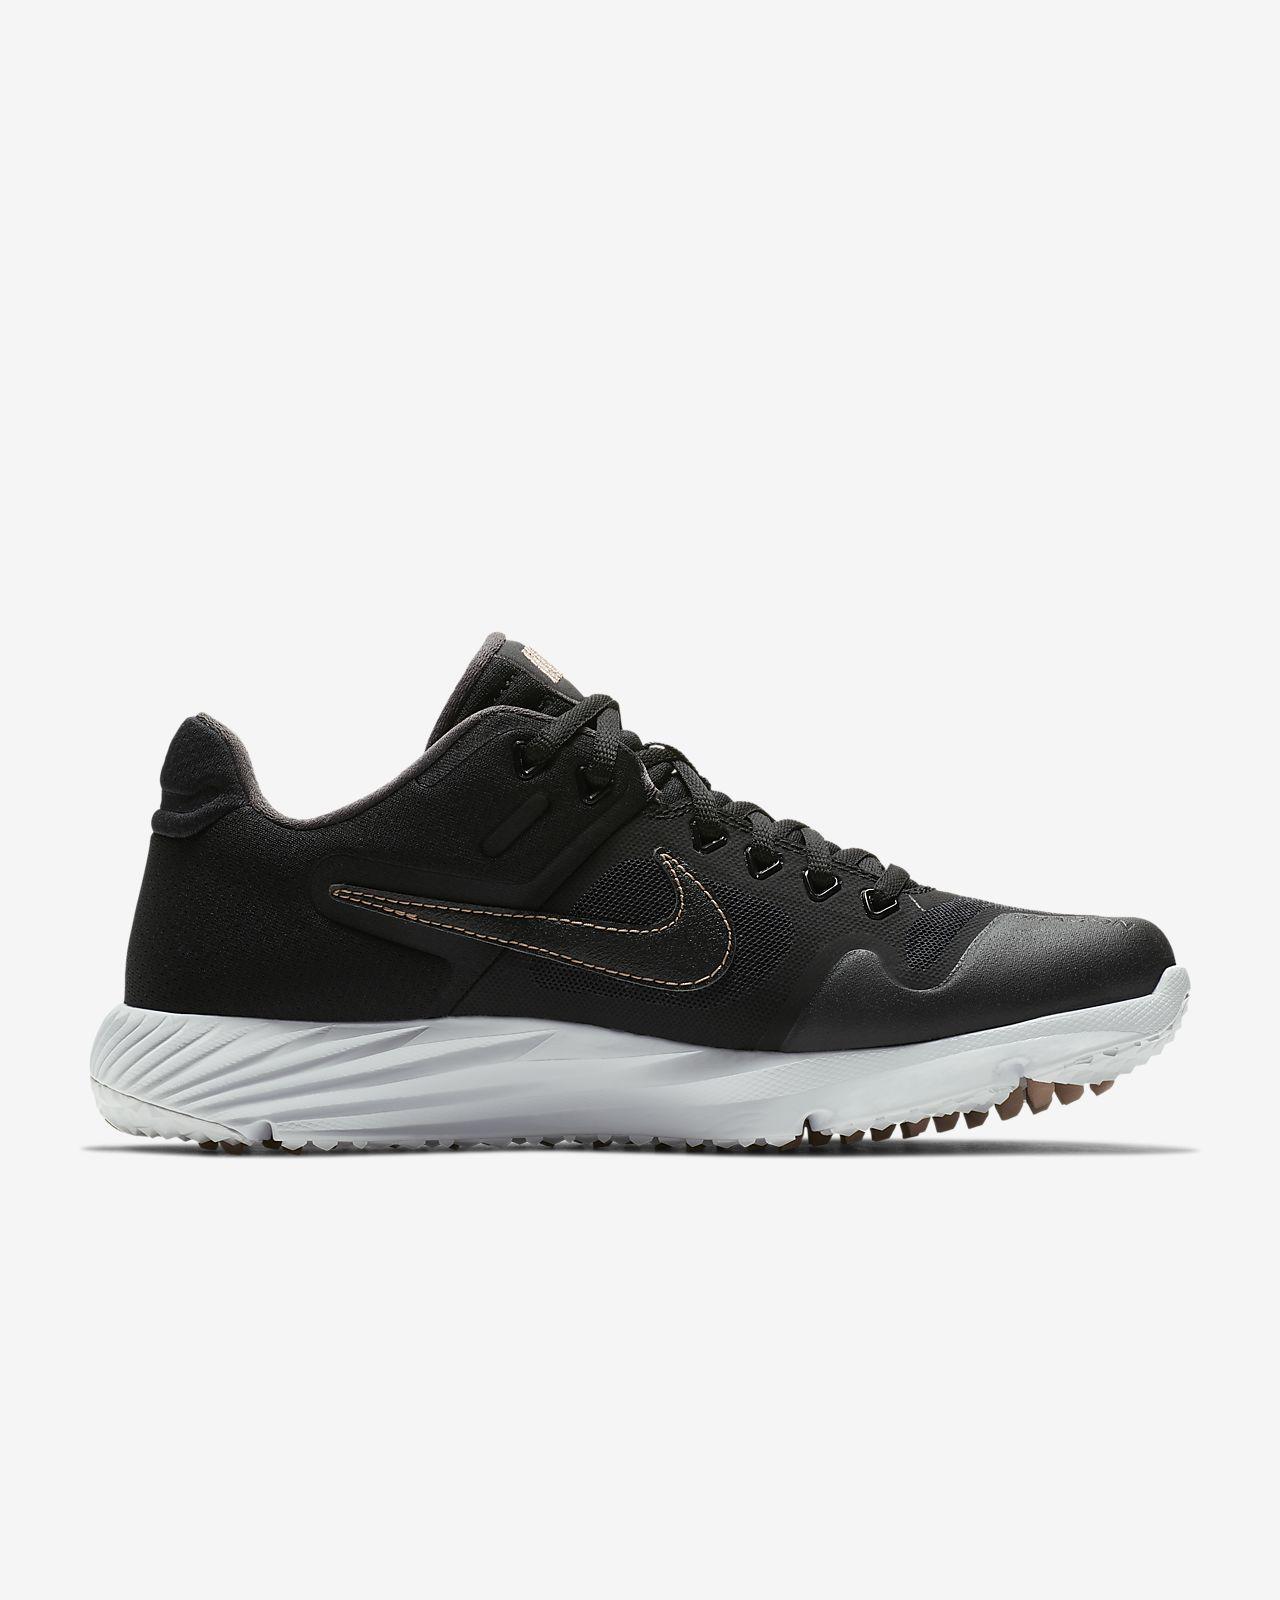 6edb89cfa09d Nike Alpha Huarache Elite 2 Turf Women's Softball Shoe. Nike.com